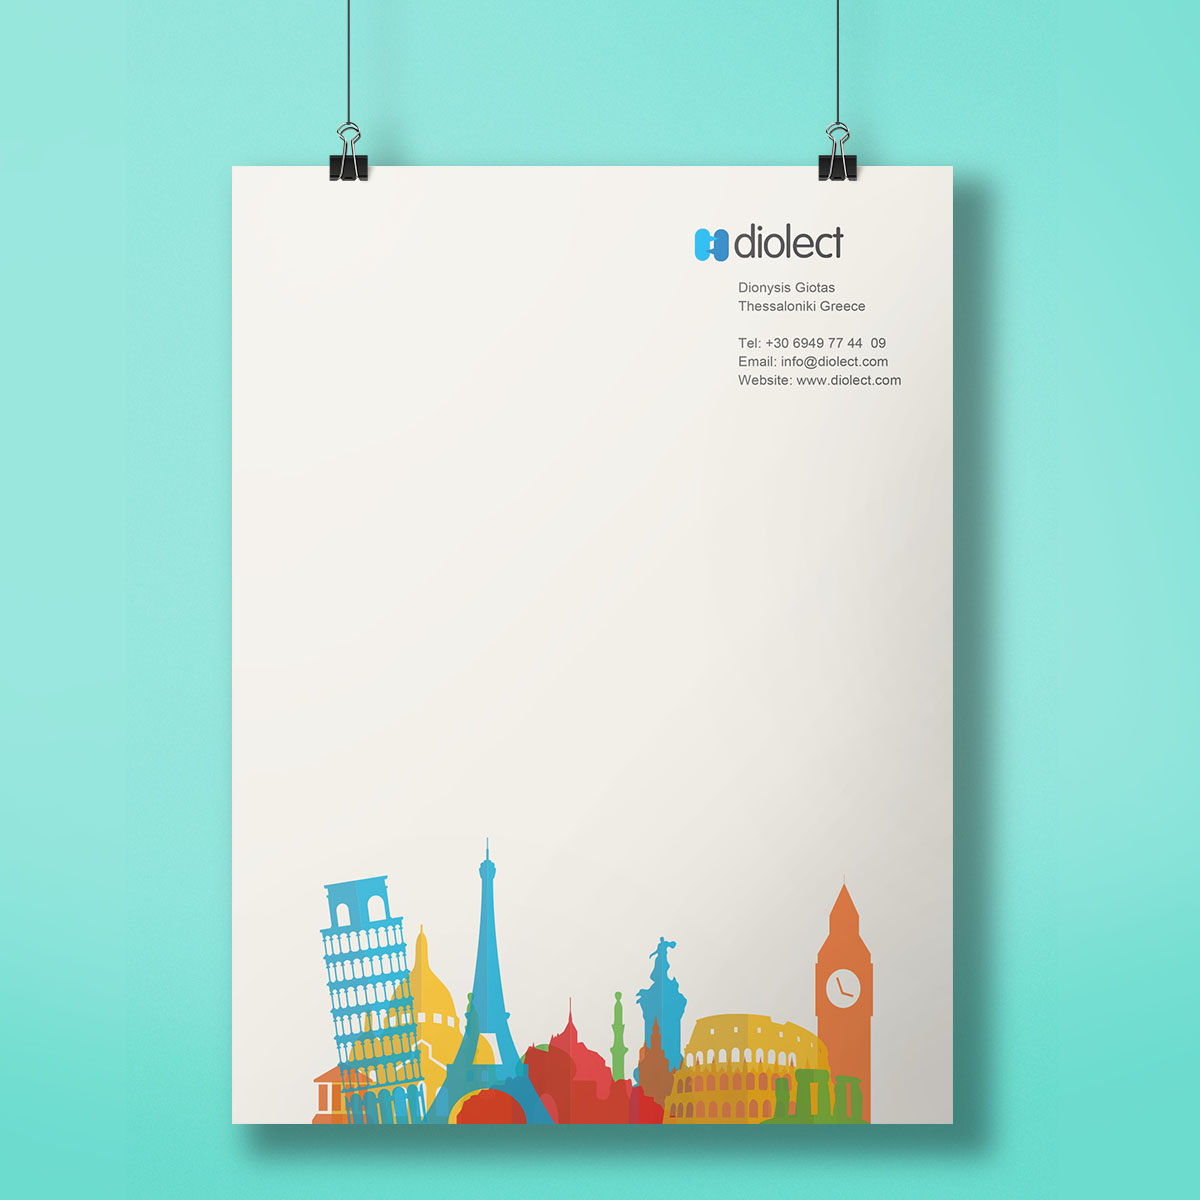 Translation House Corporate Stationery Design: Dimension Web & Graphic Design Portfolio